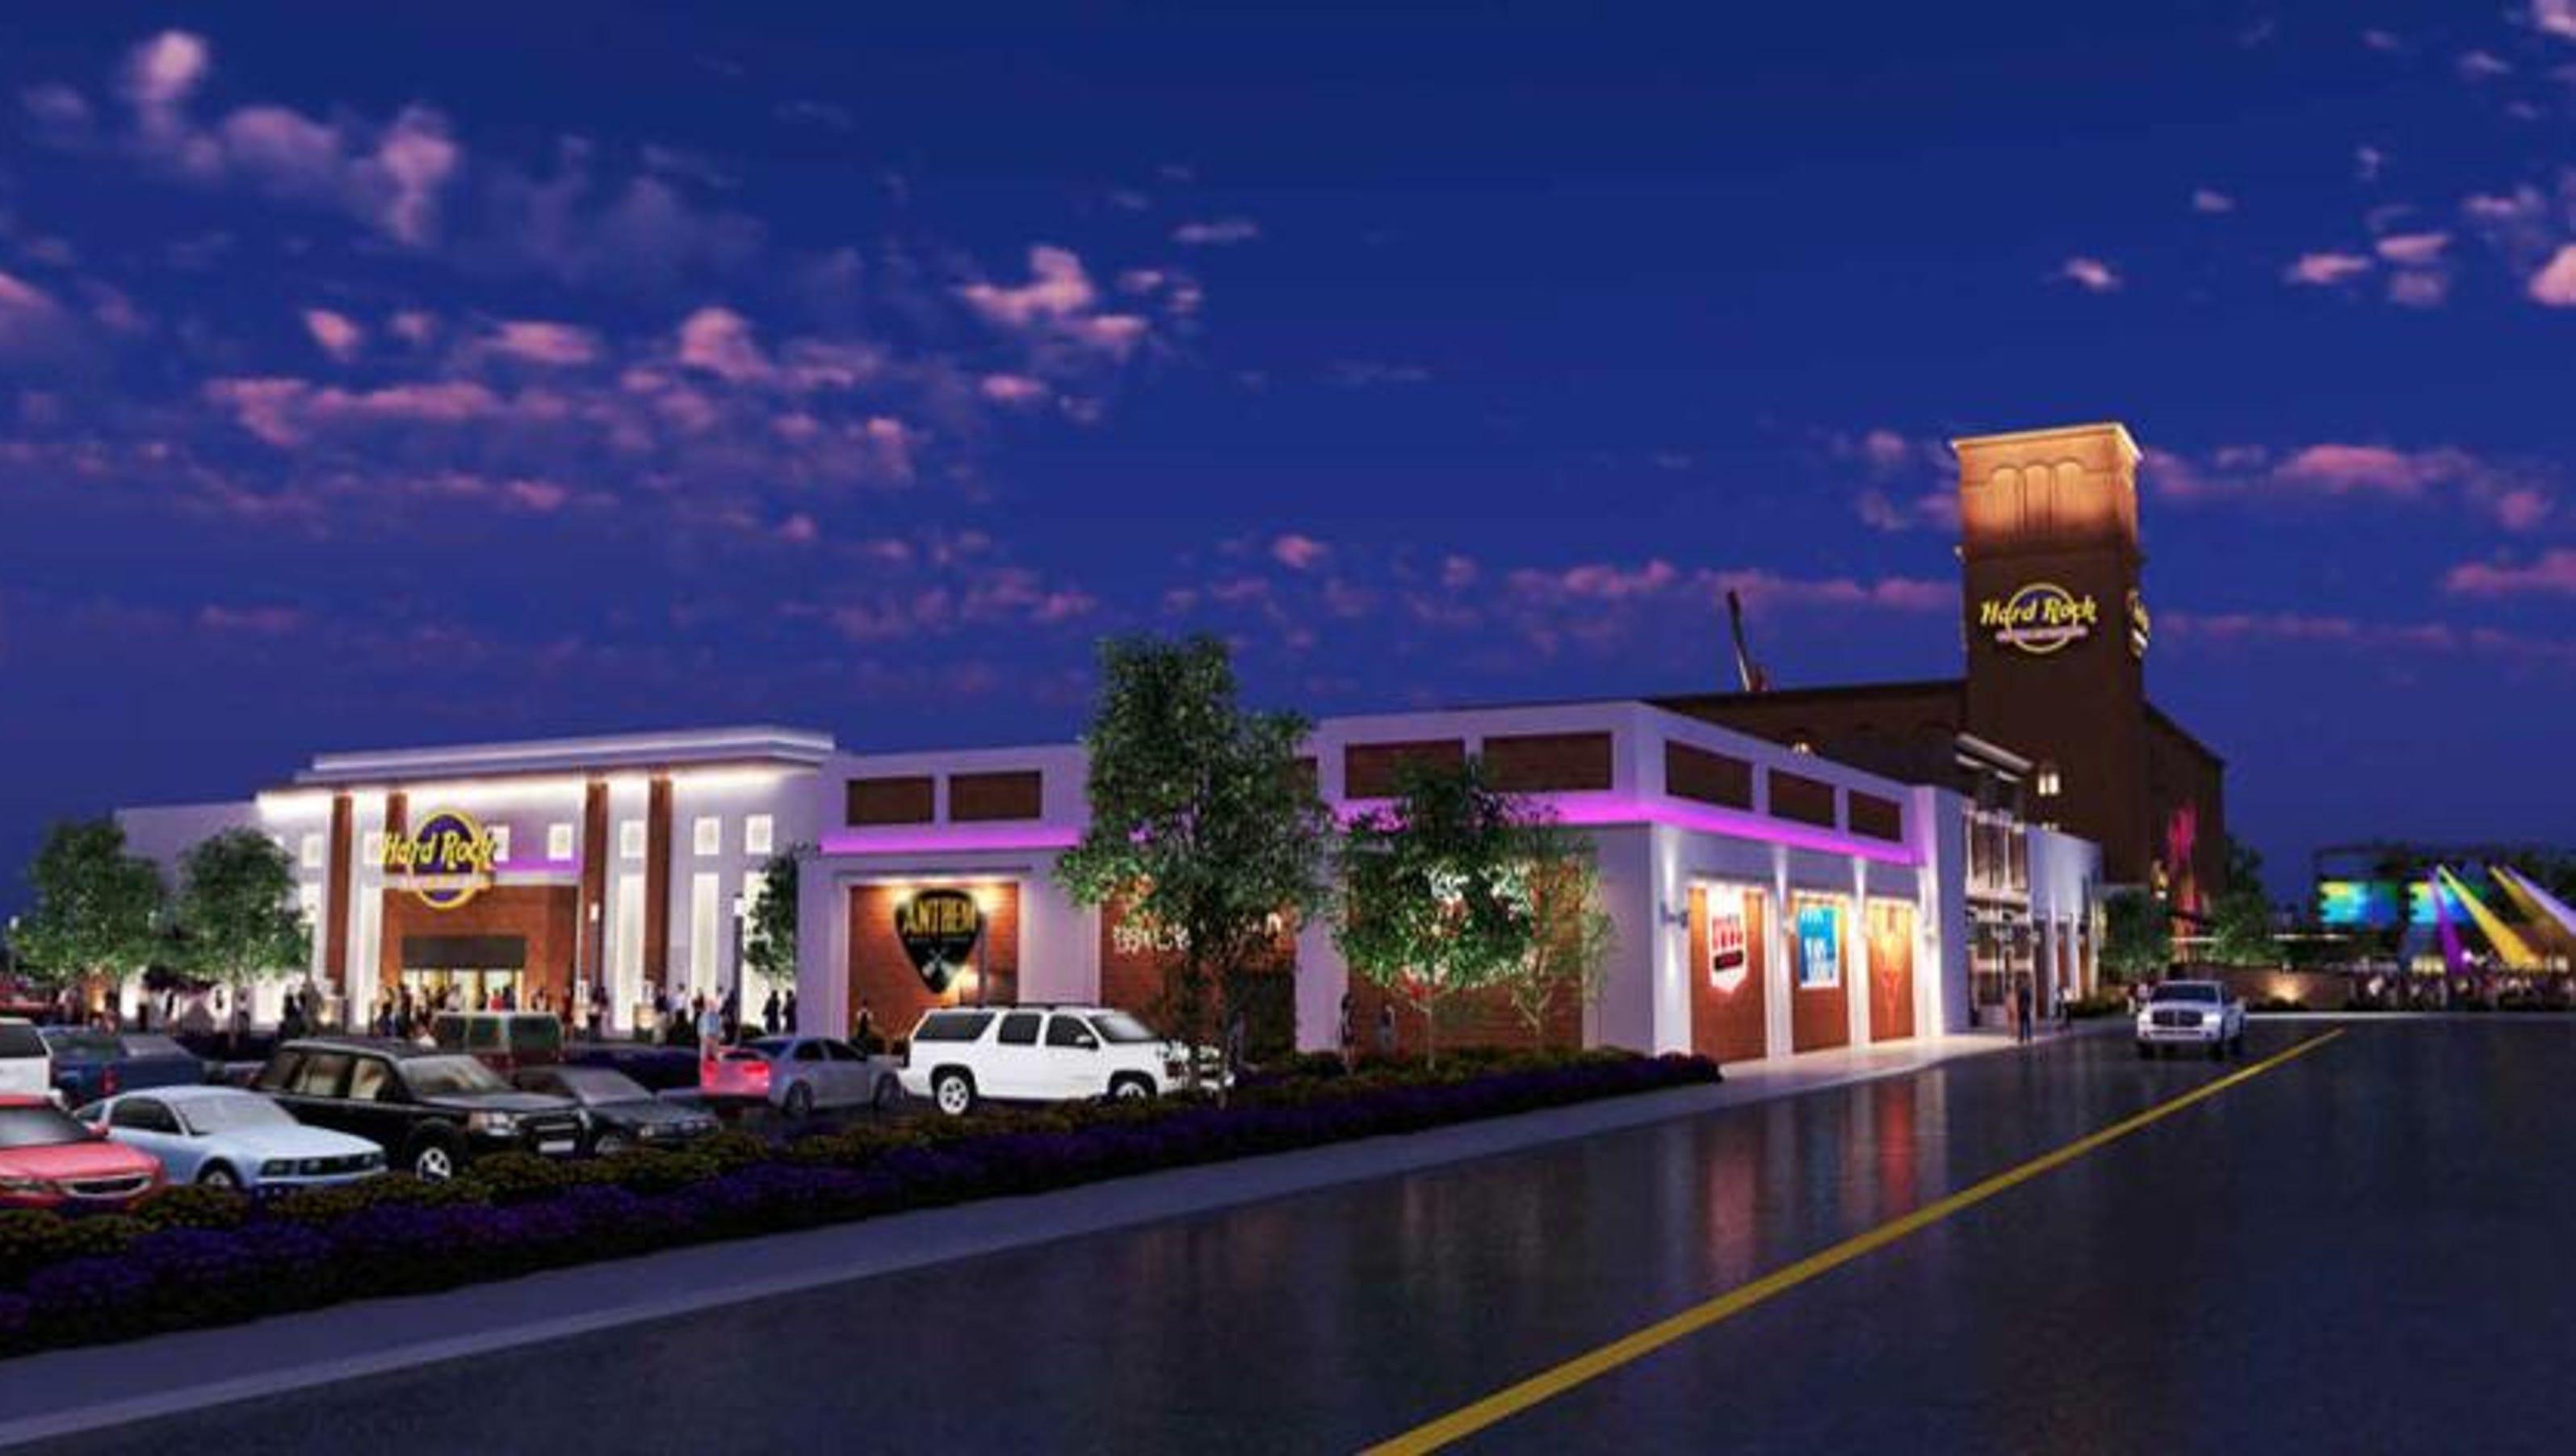 Argosy casino + sioux city new calgary stampede casino